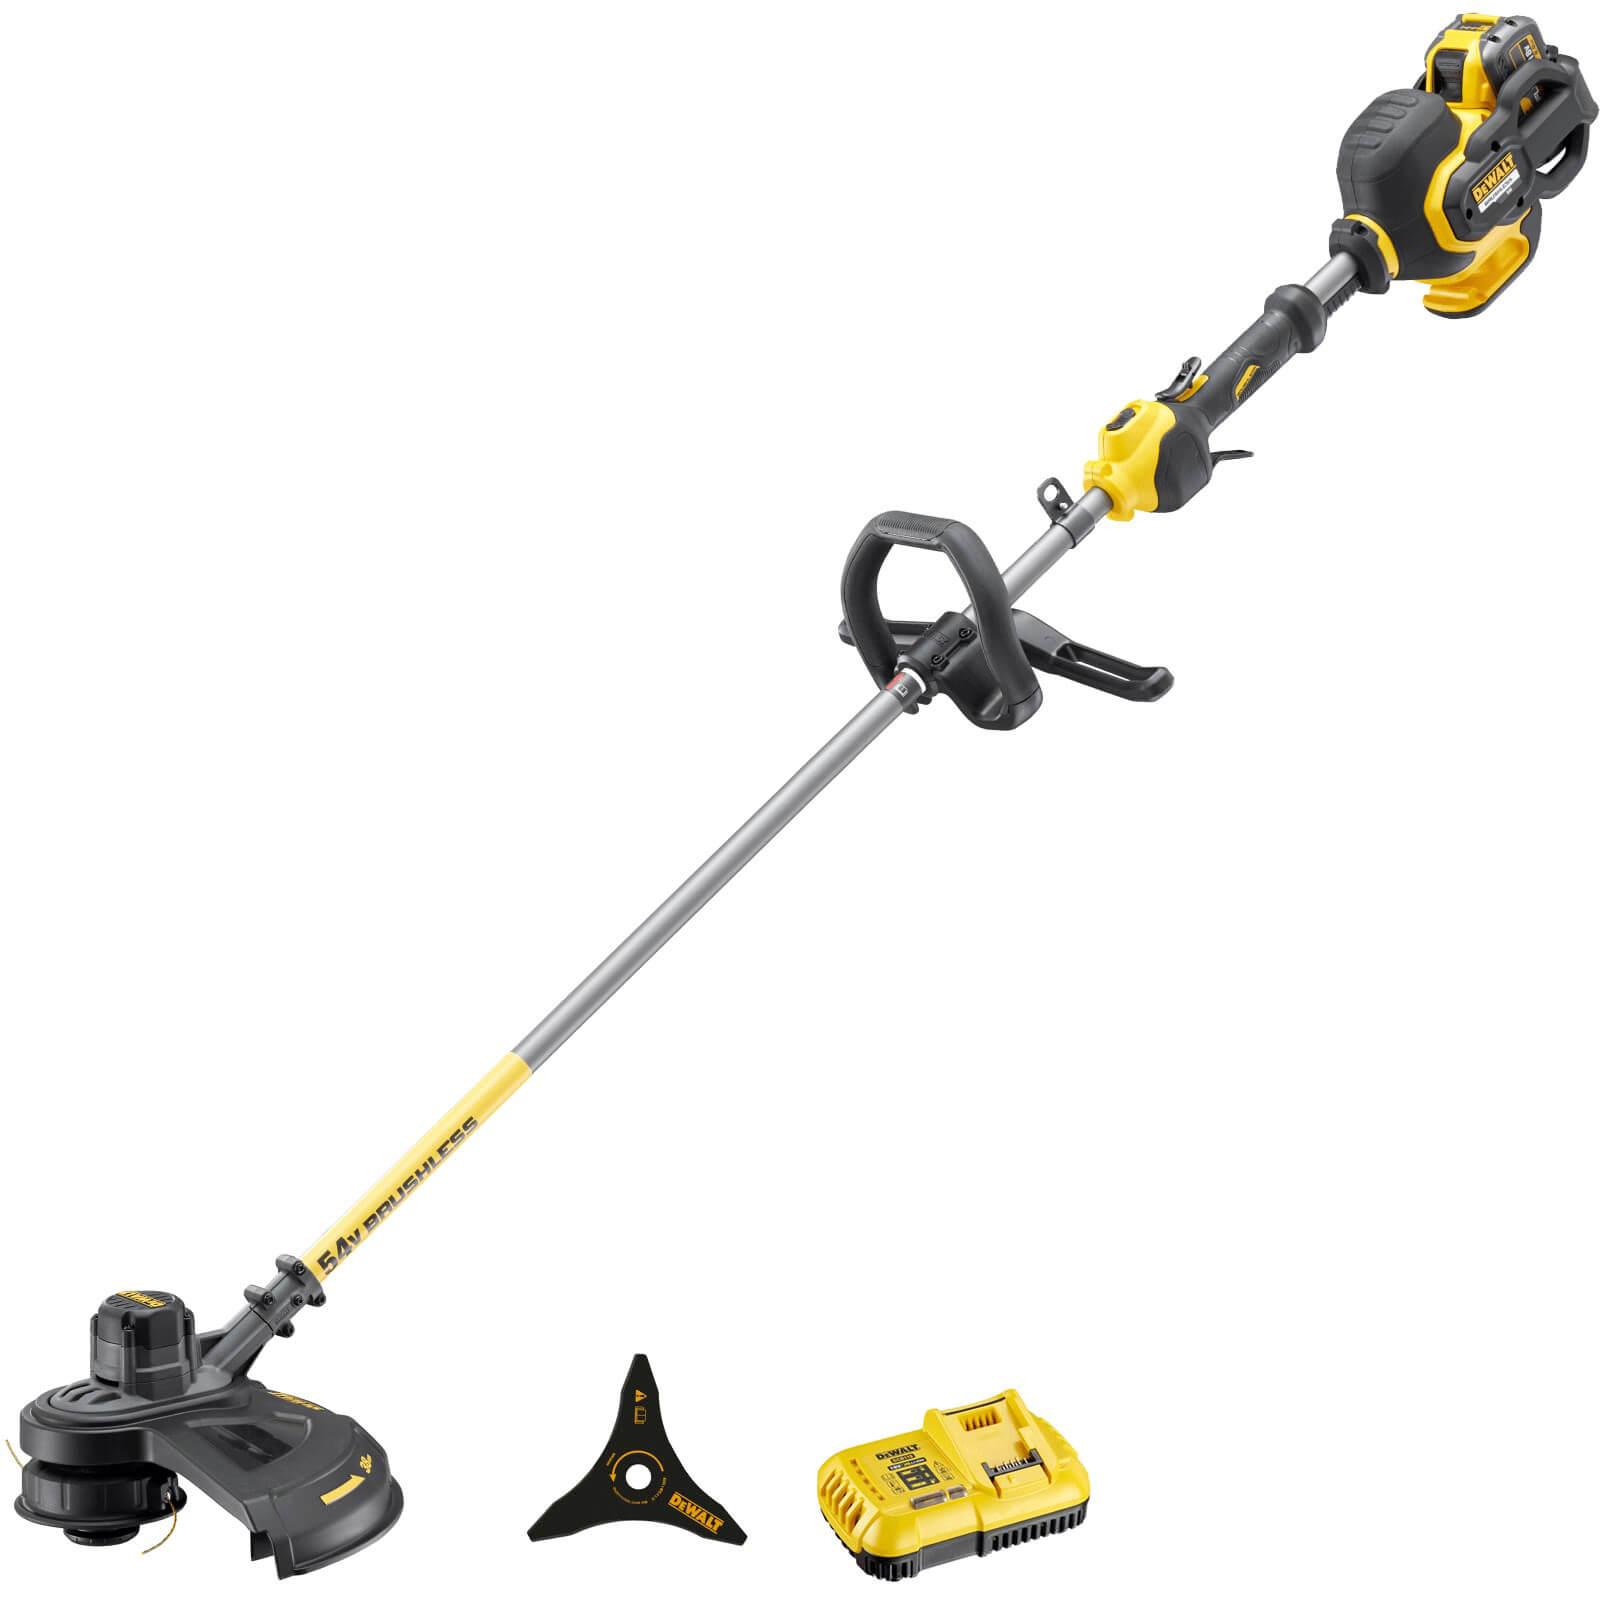 Dewalt Dcm571 54v Cordless Xr Flexvolt Brush Cutter Amp Line